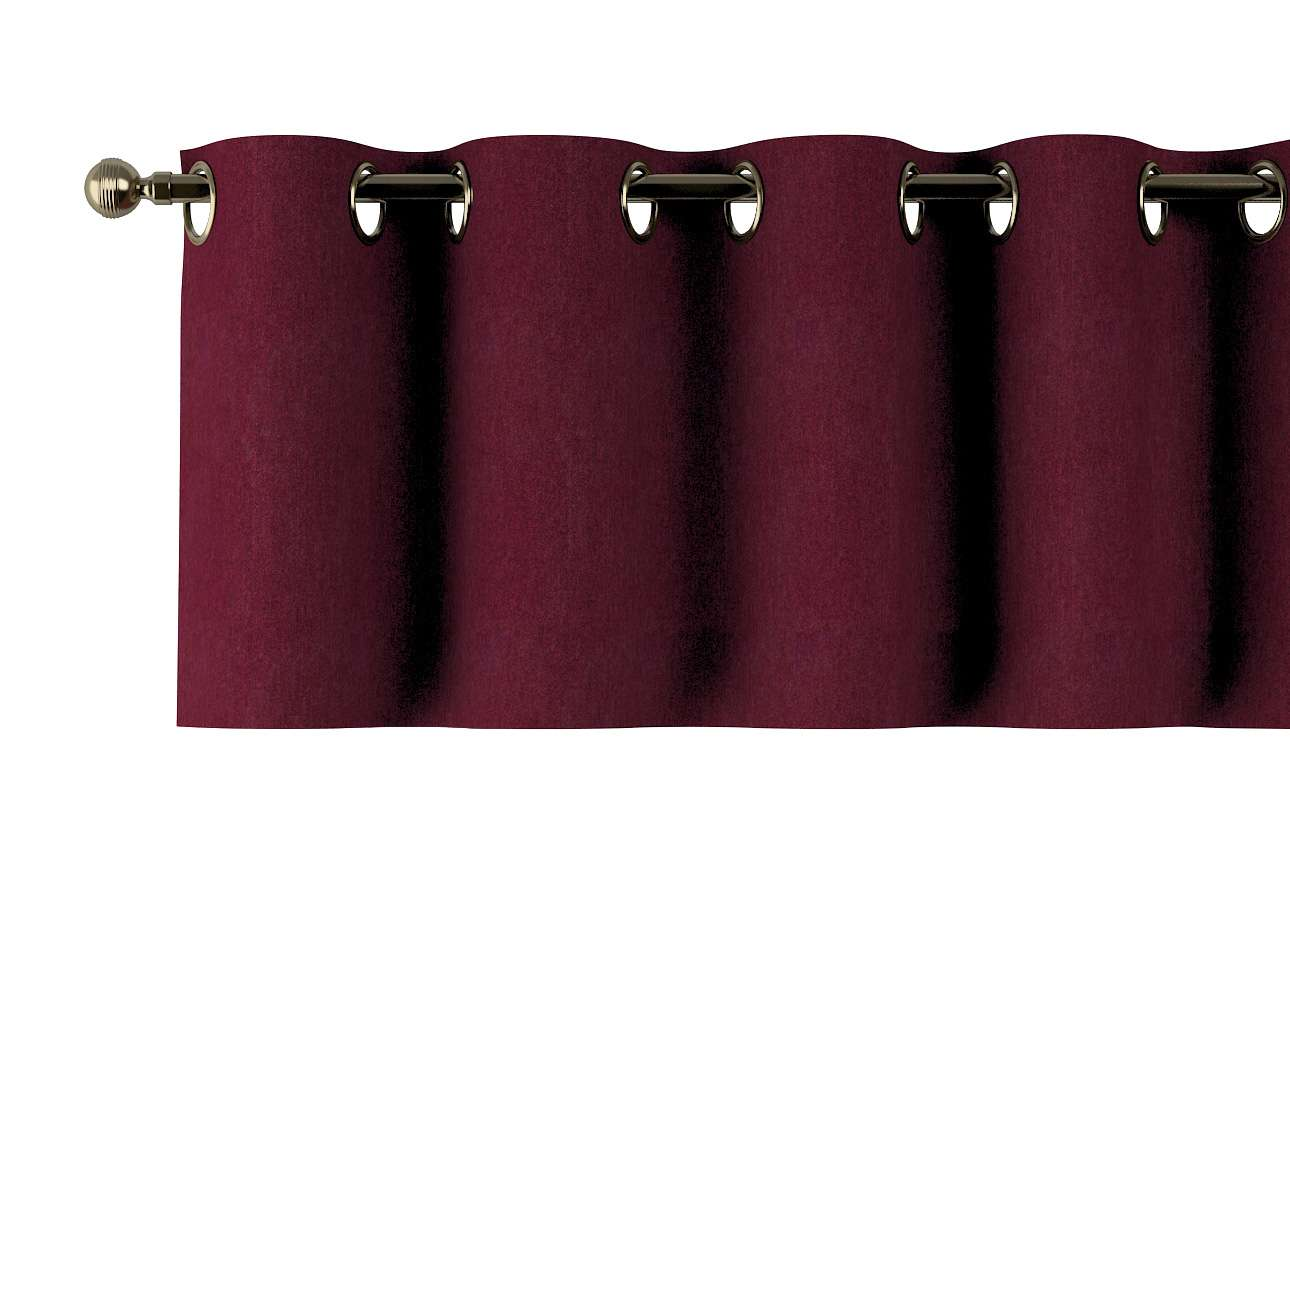 Lambrekin na kółkach 130x40cm w kolekcji Chenille, tkanina: 702-19